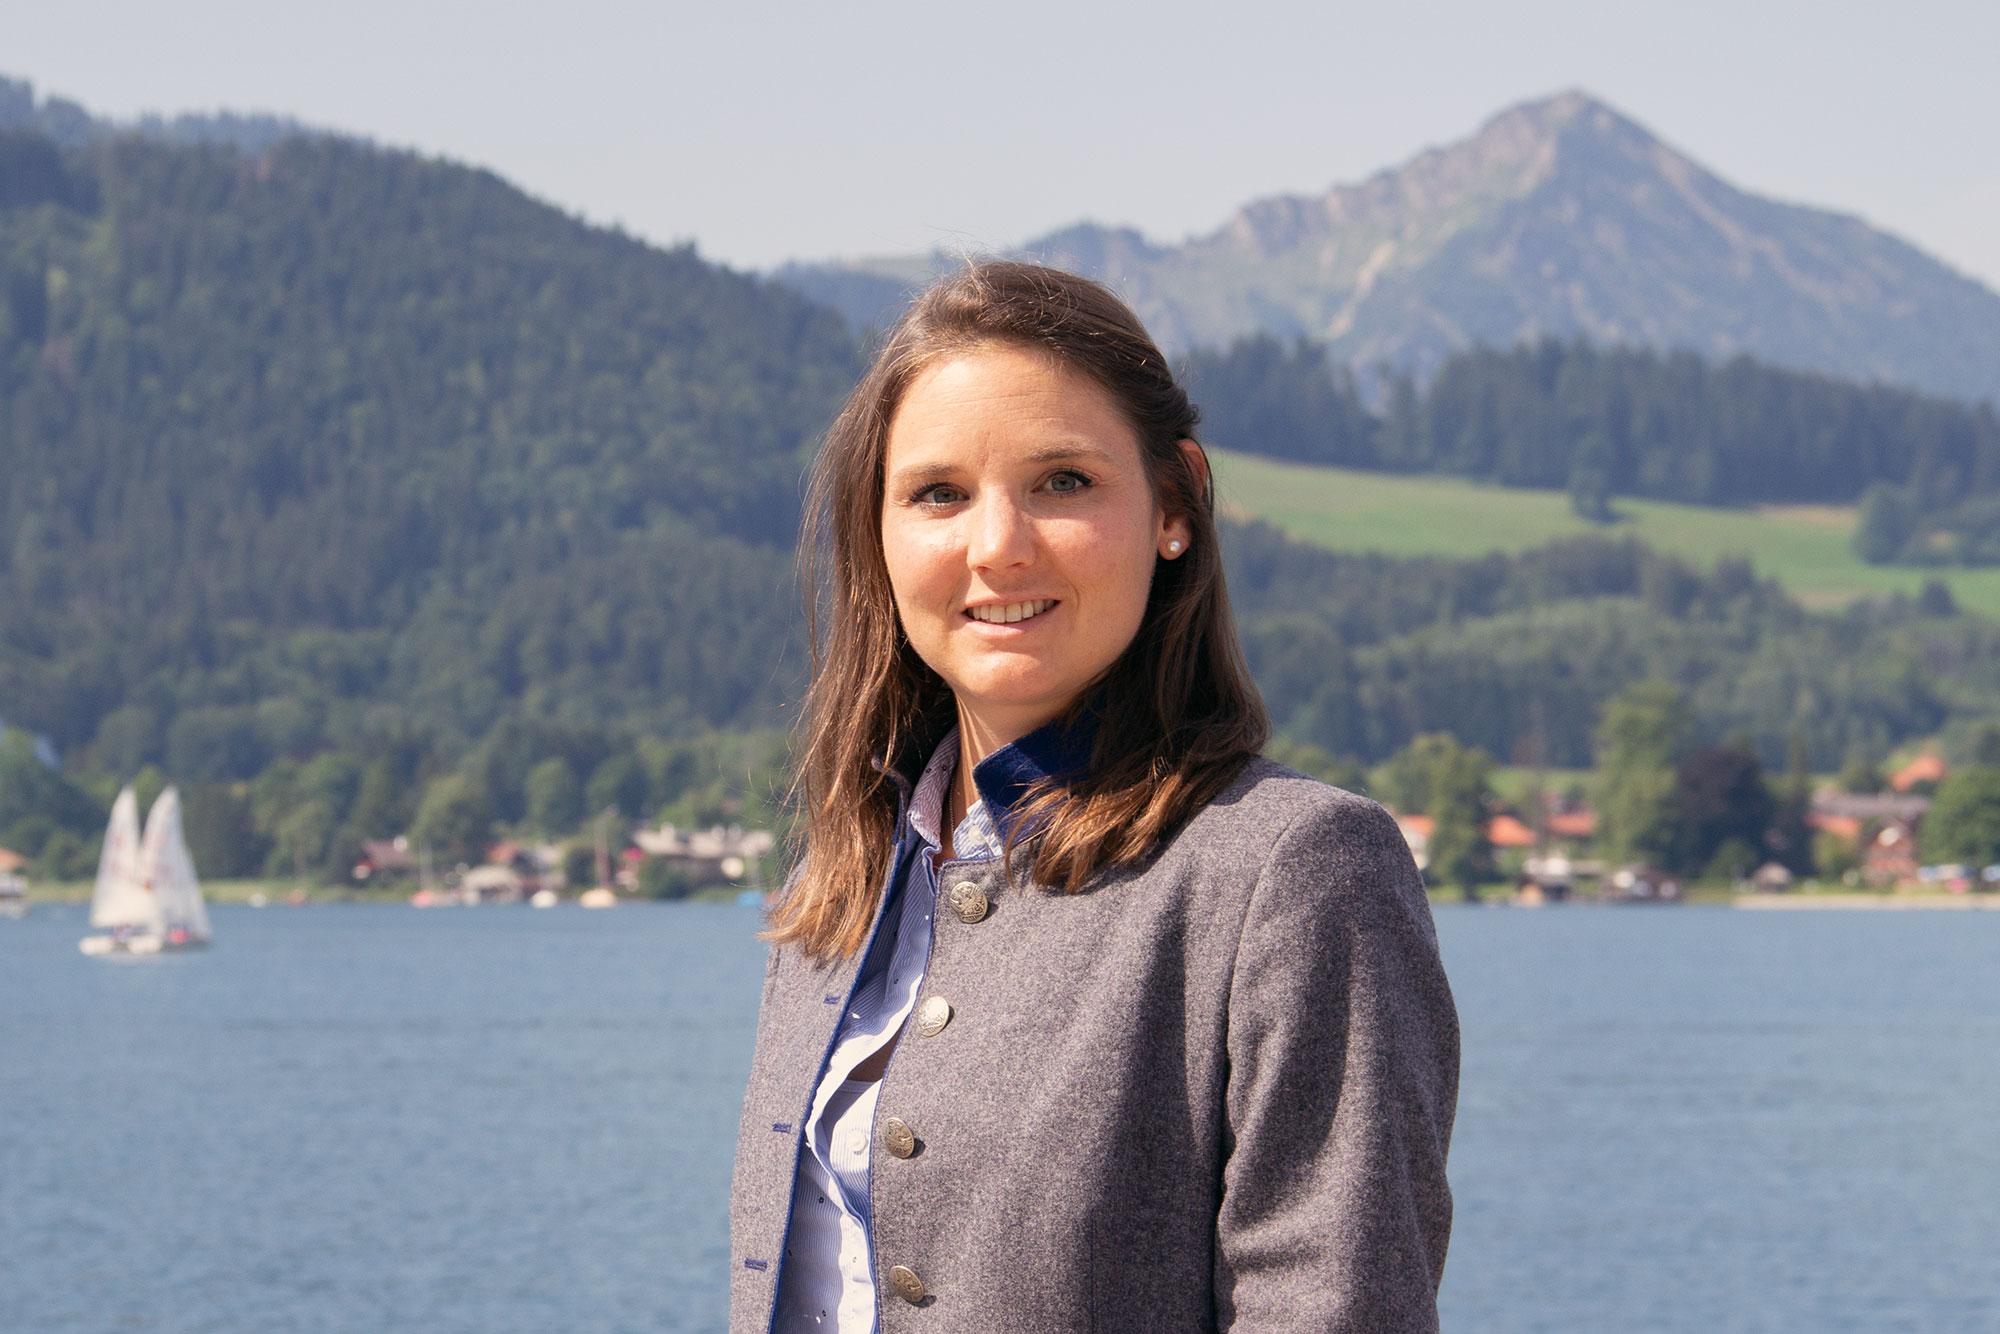 Stefanie Volz